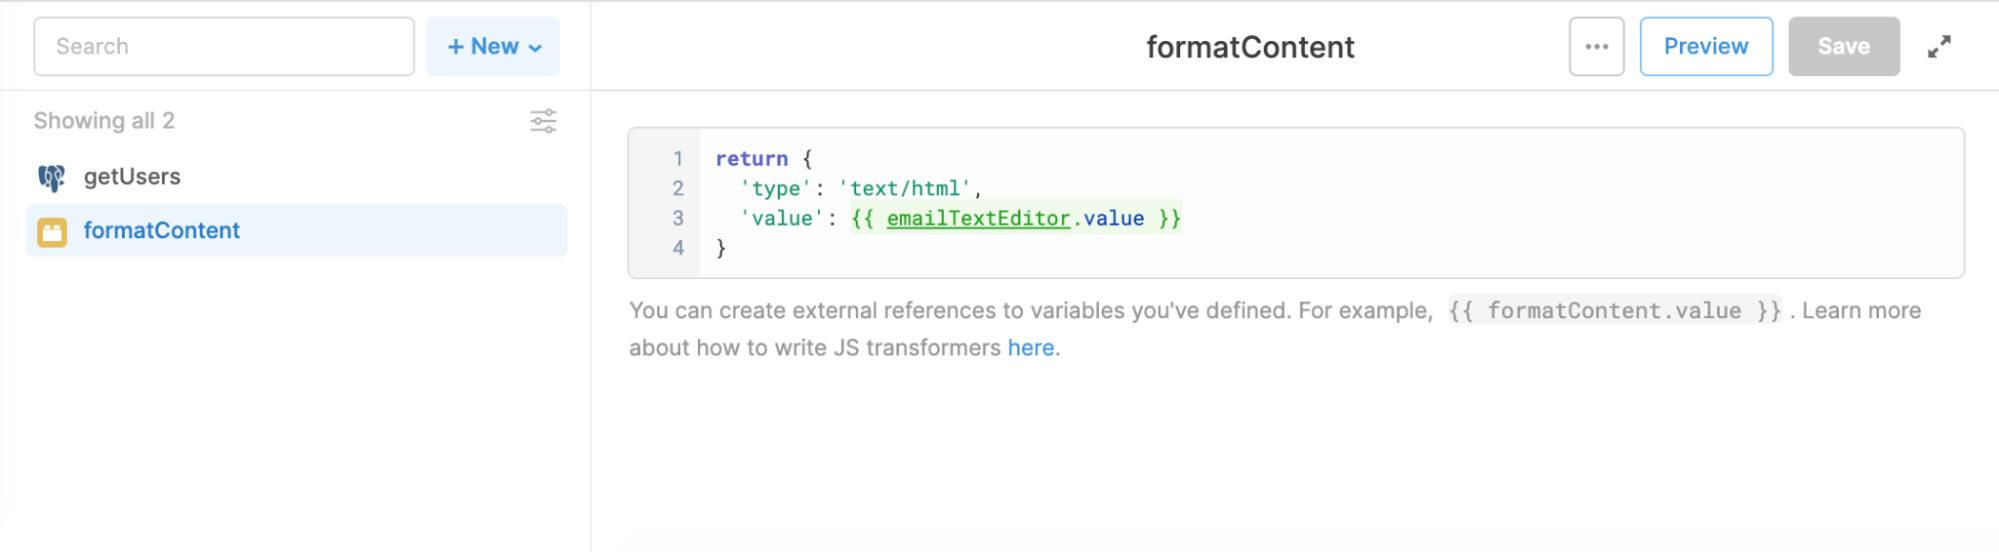 formatcontent transformer